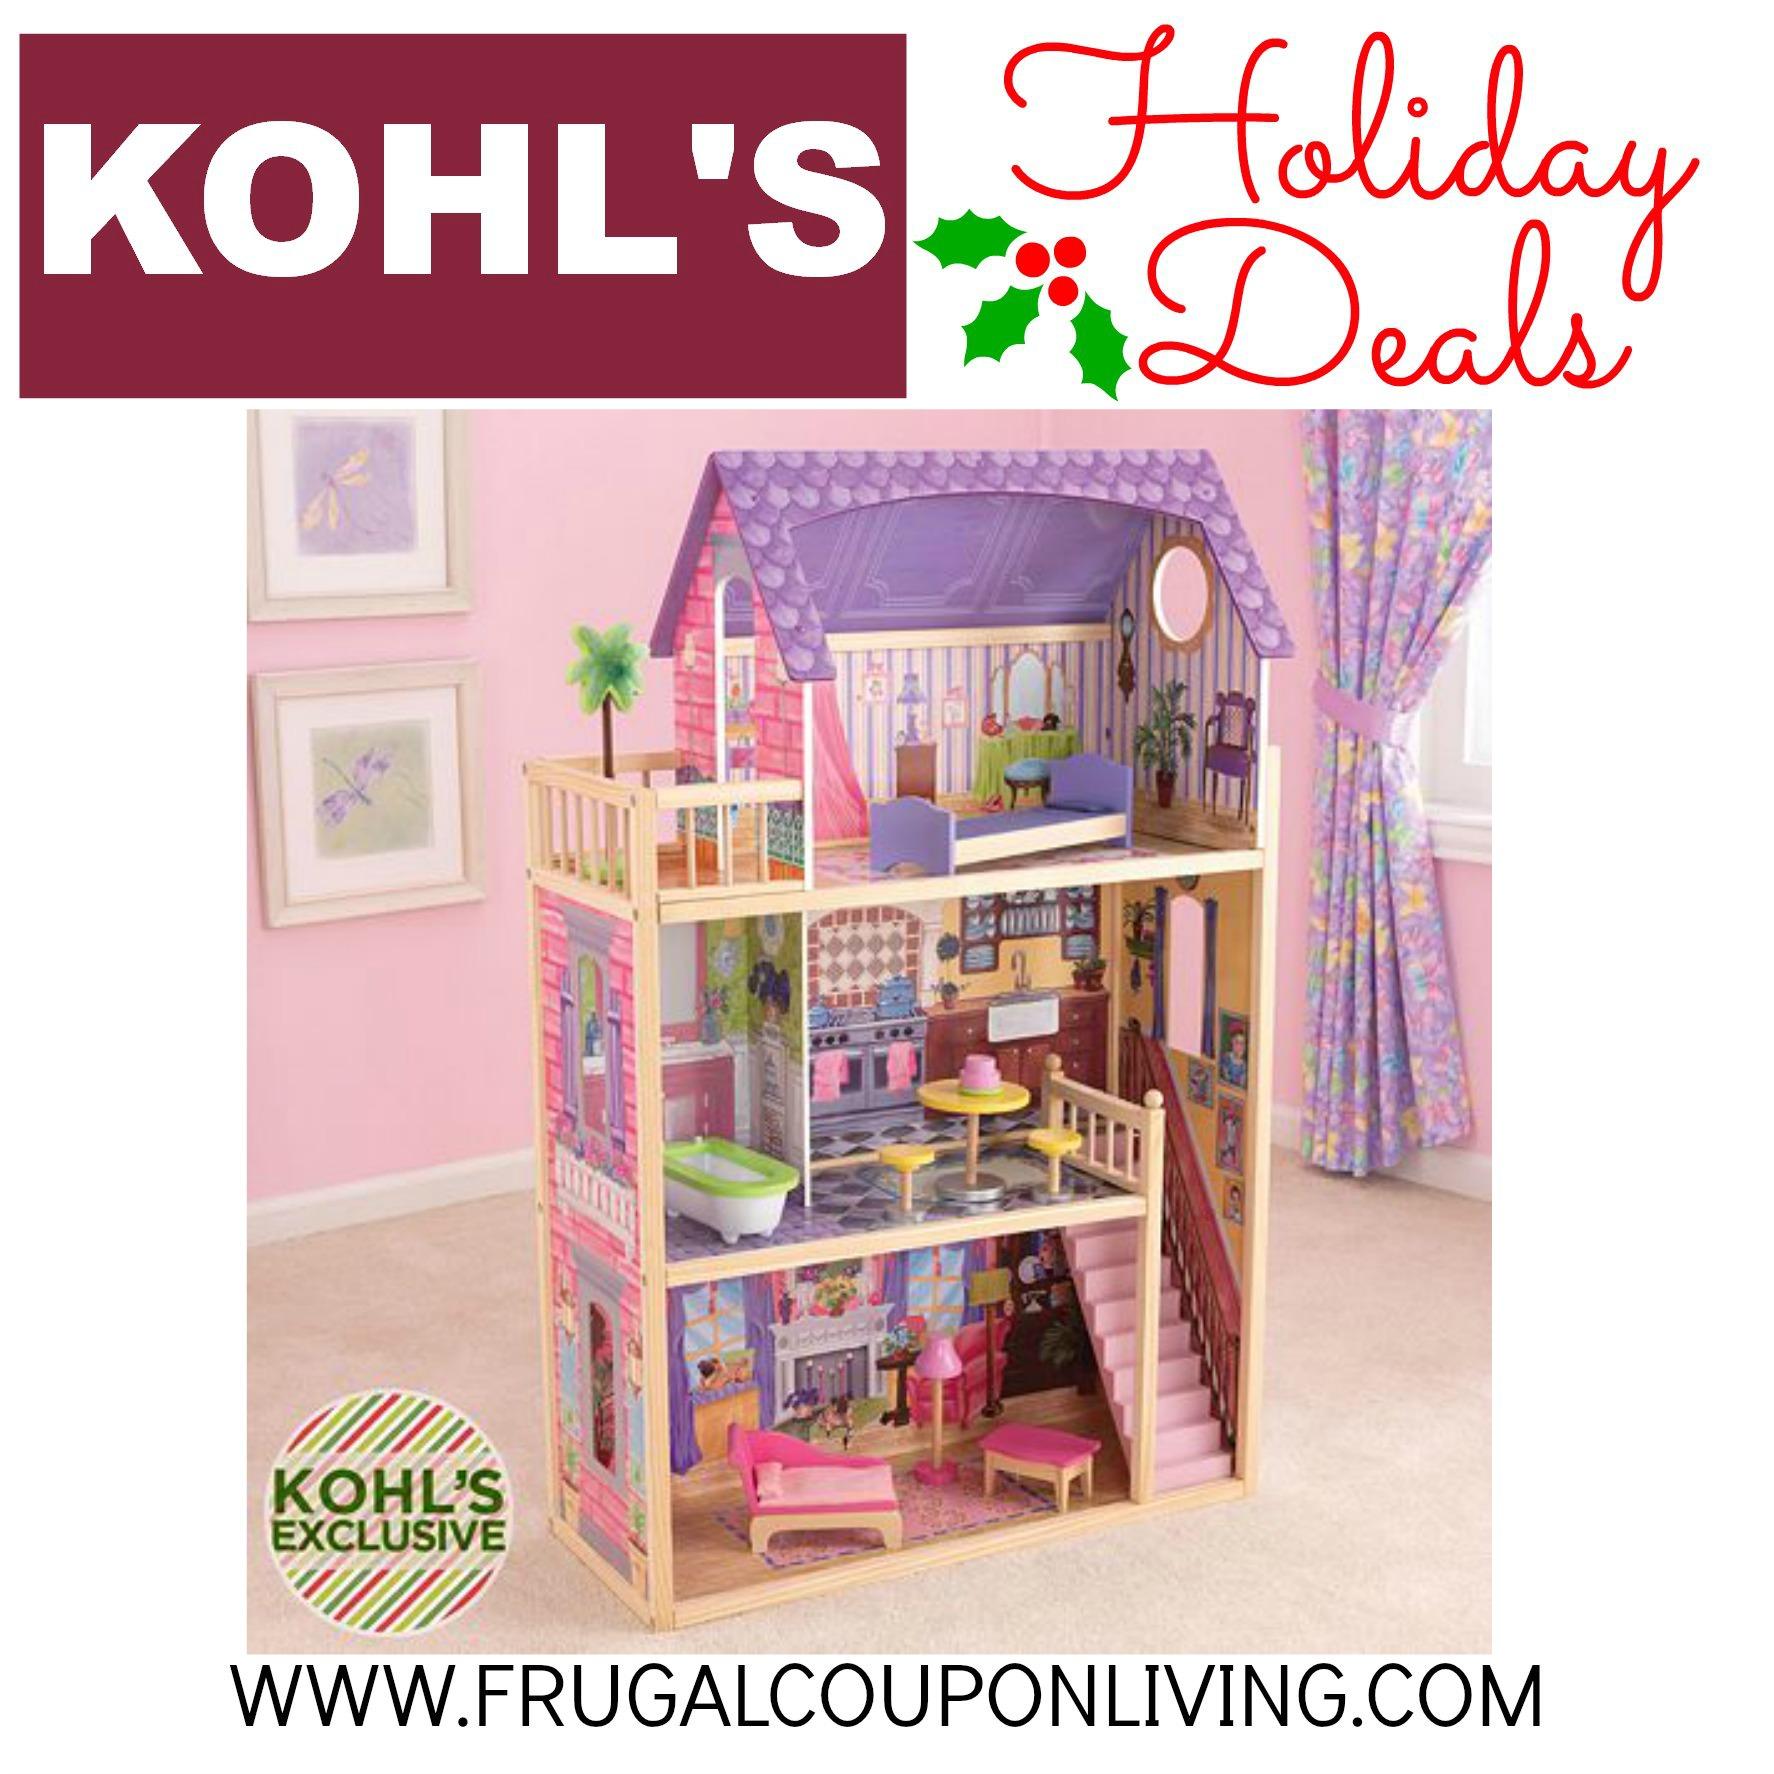 Pink Step 2 Kitchen Step2 Kohls Pre Black Friday Play Kitchen Sale 3599 From 130